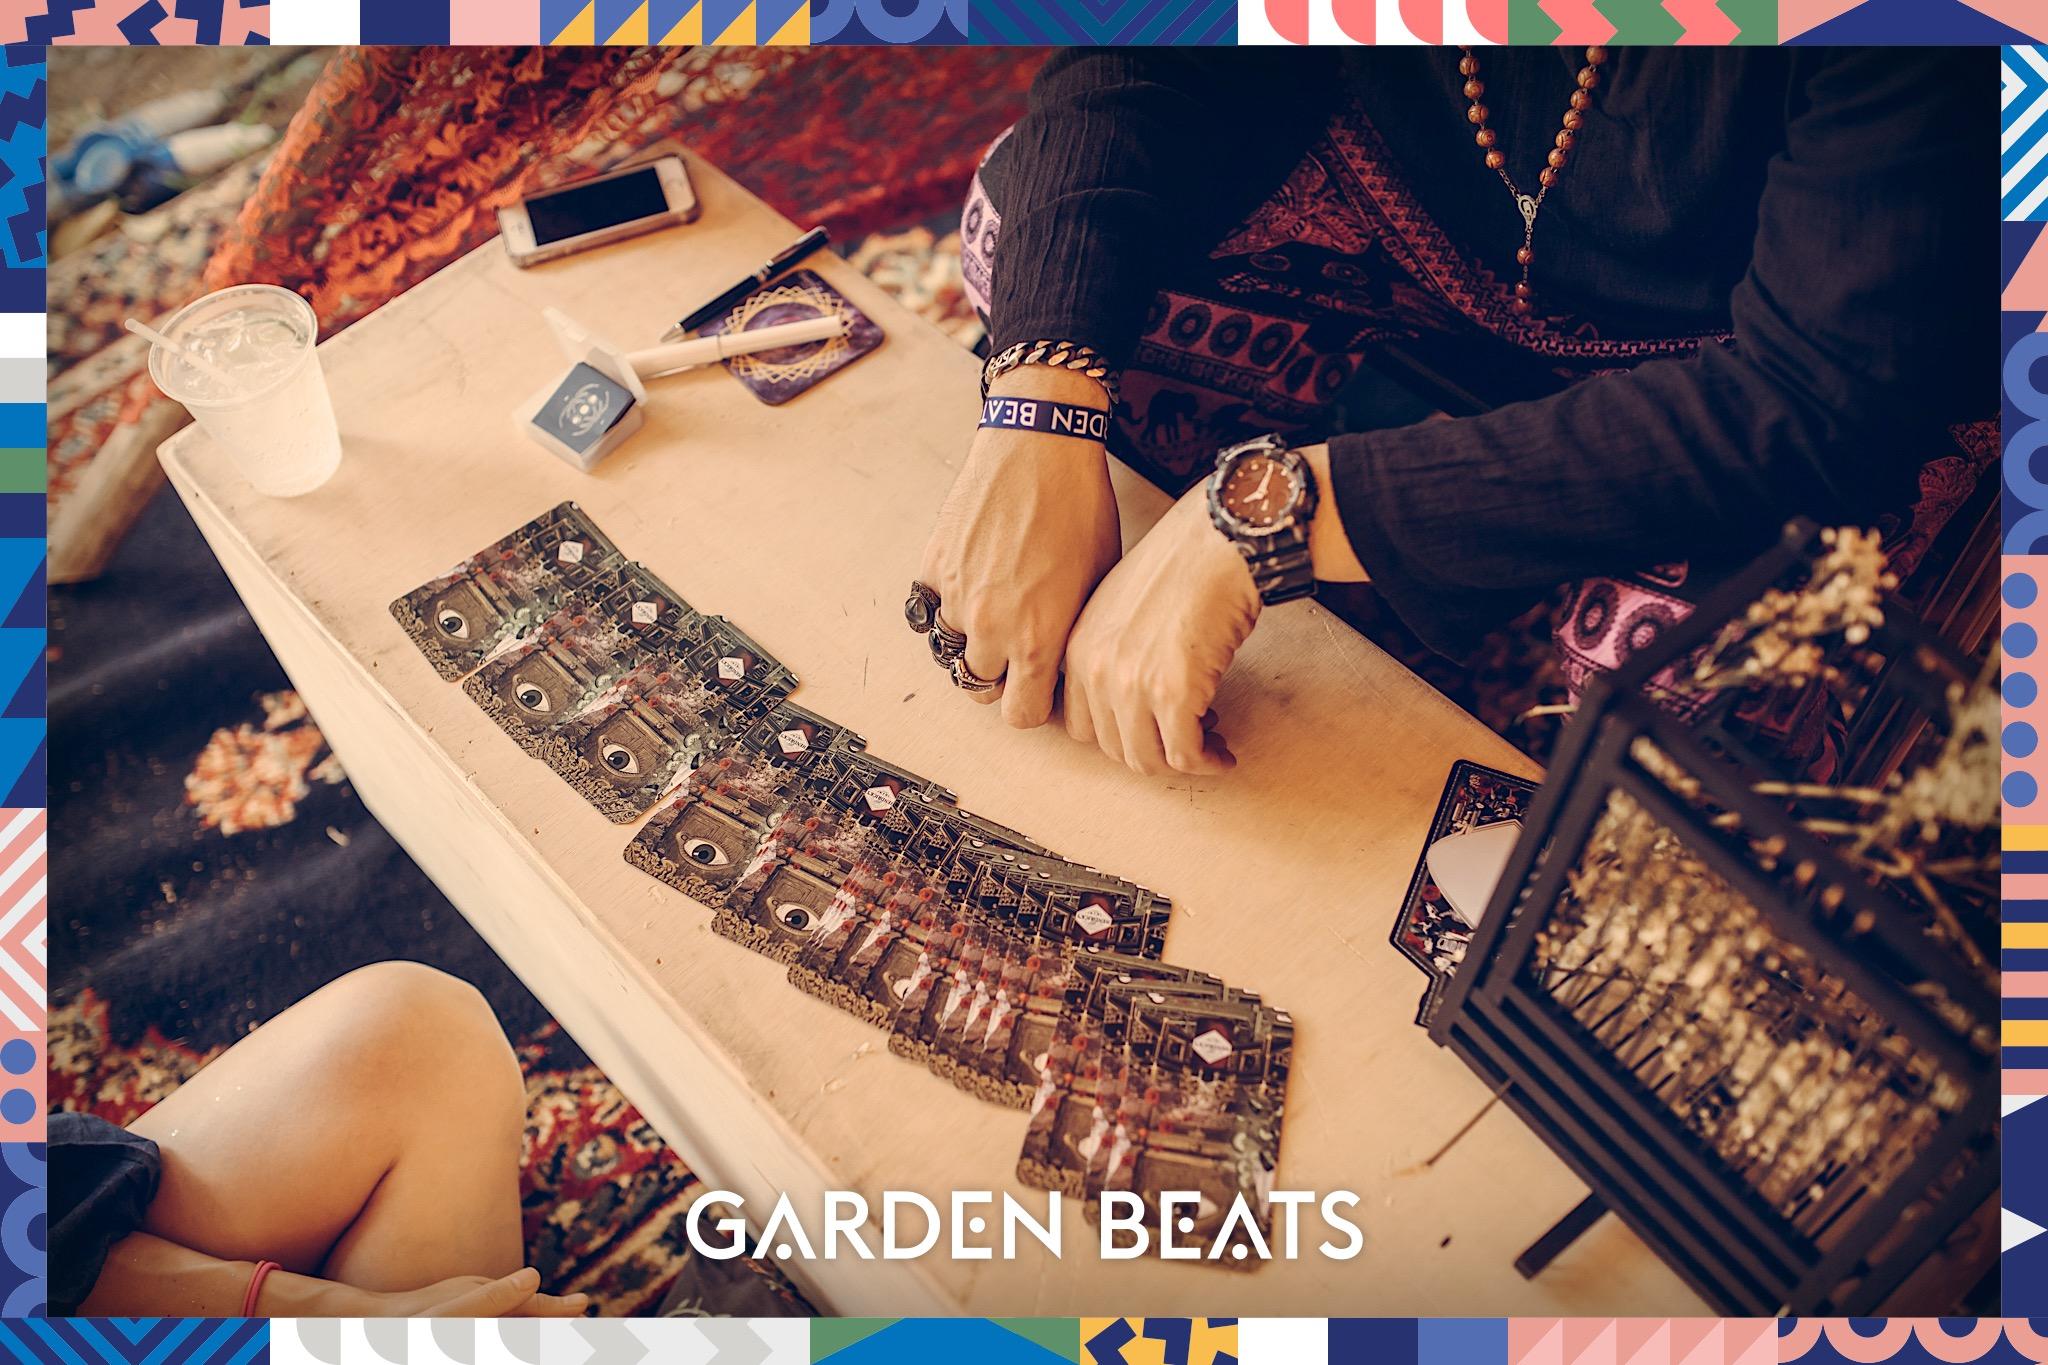 03032018_GardenBeats_Colossal186_Watermarked.jpg